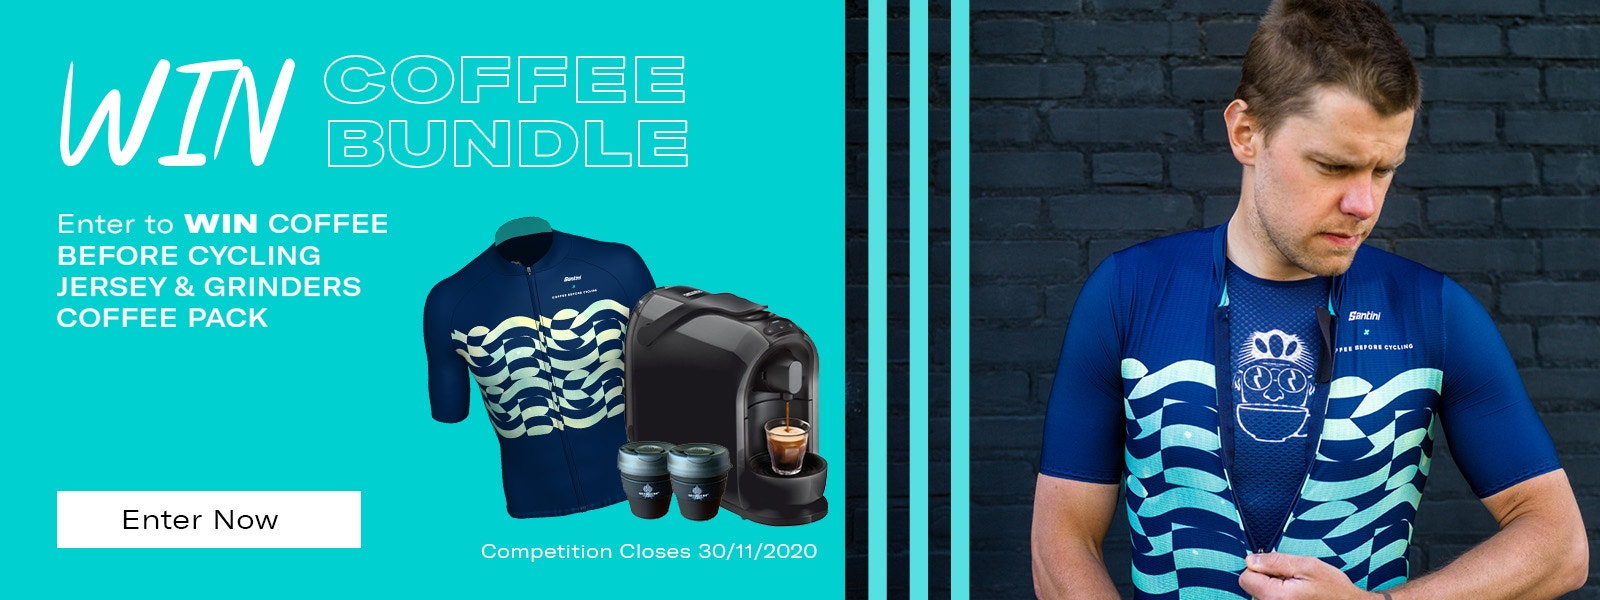 win-coffee-bundle